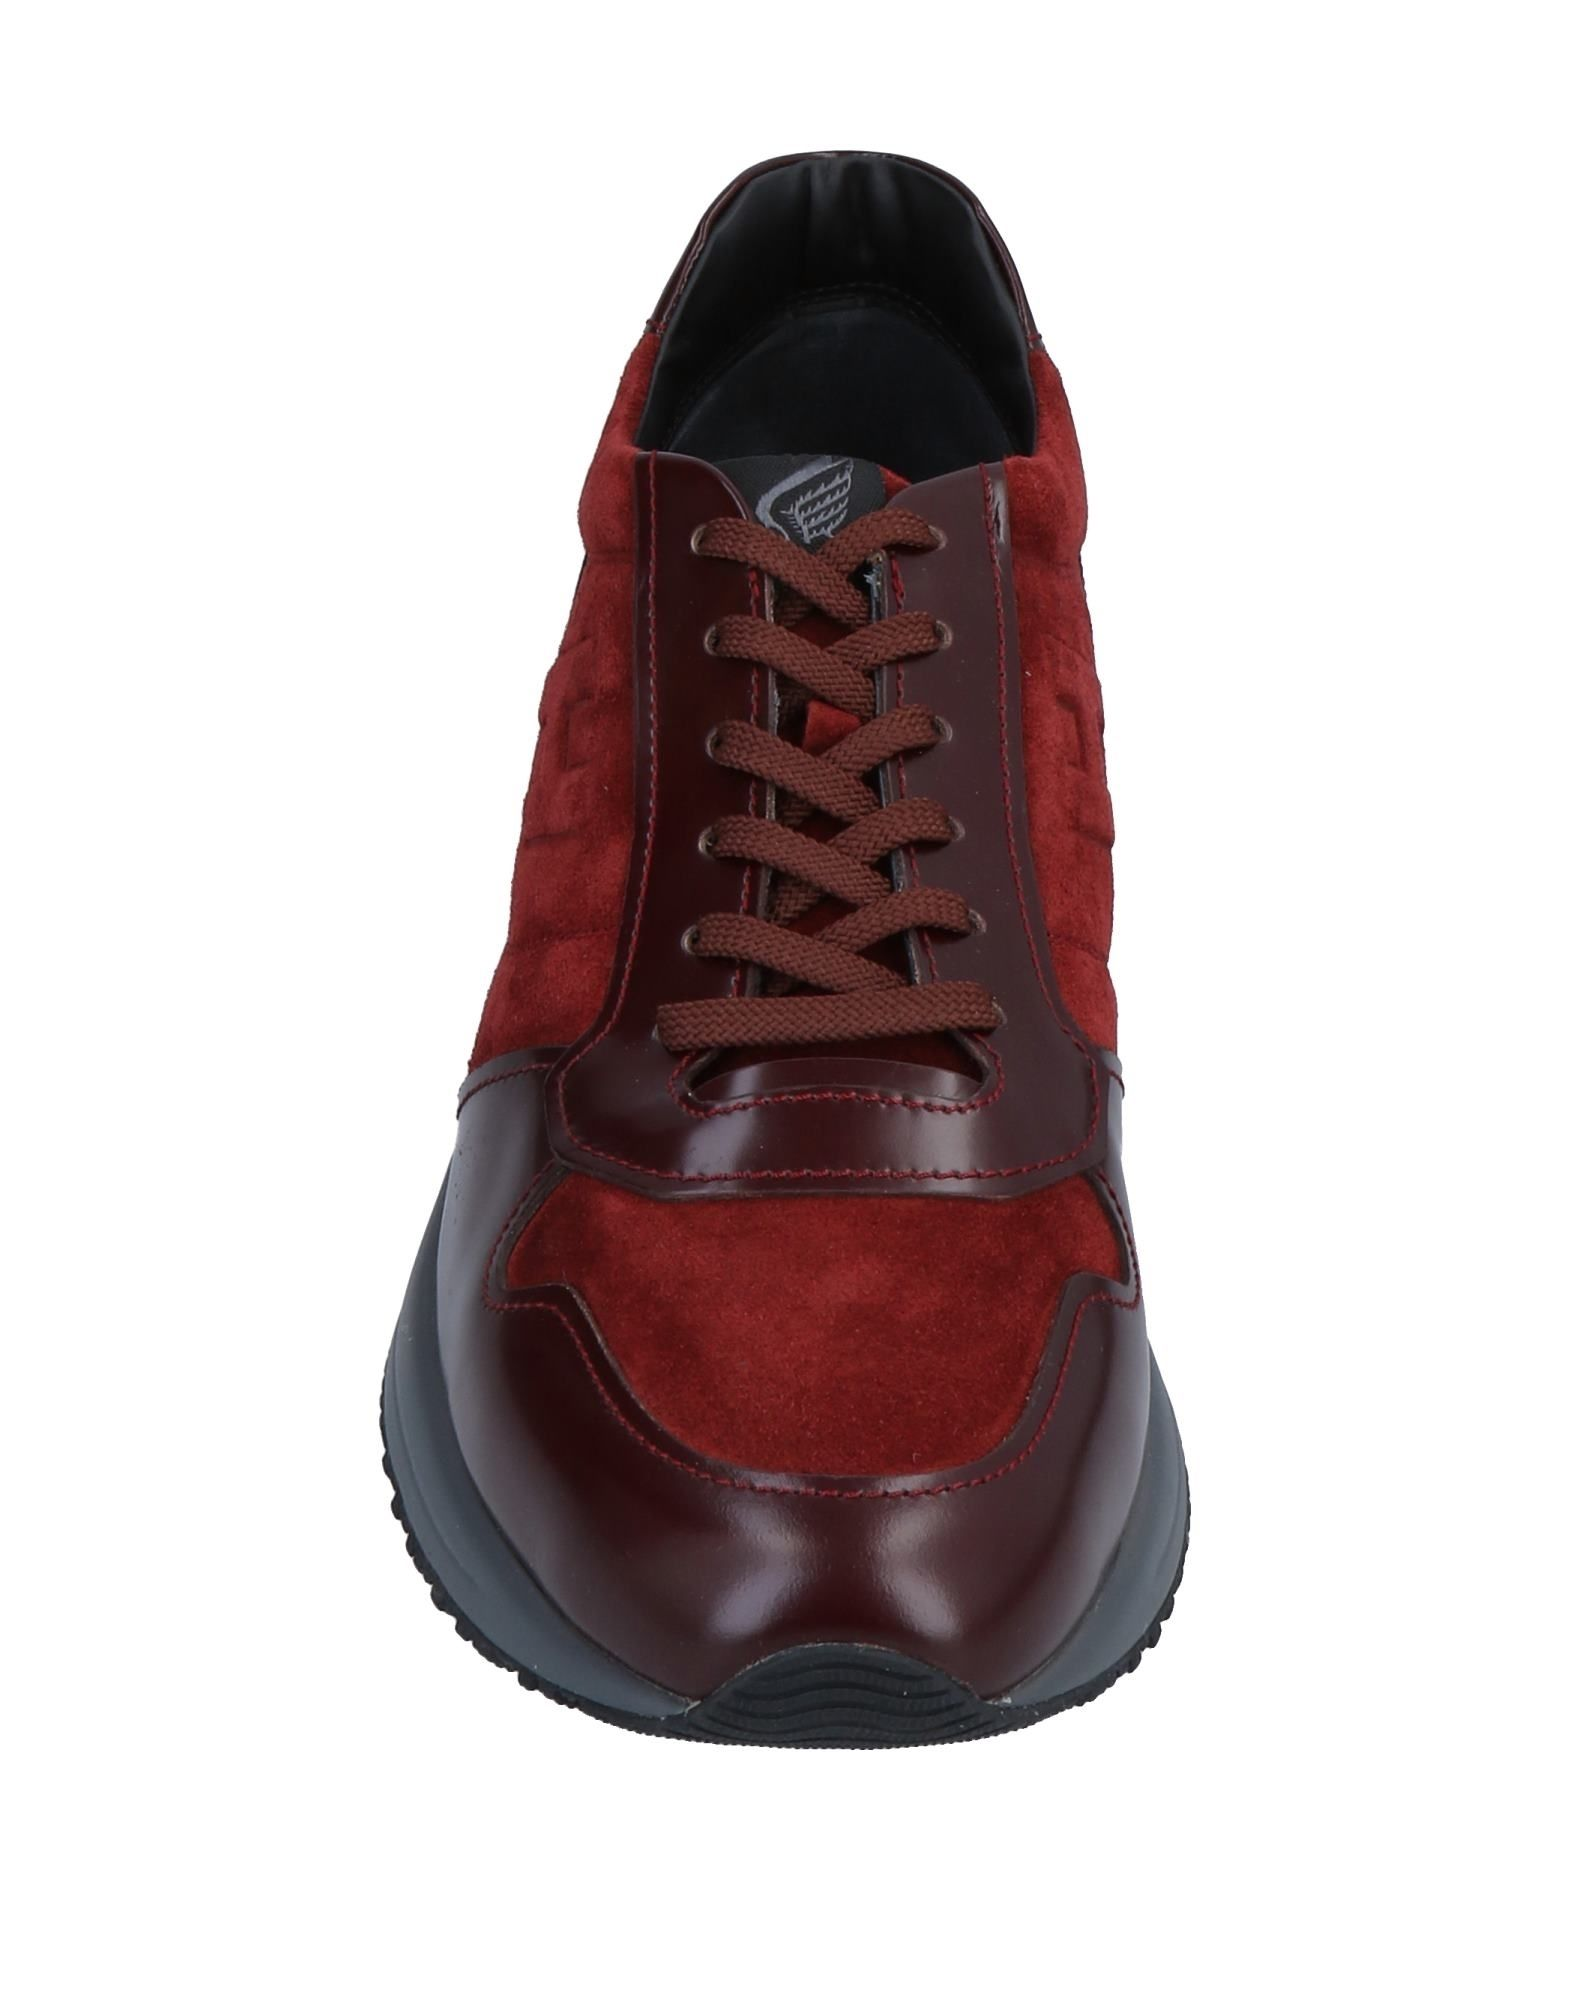 Hogan Sneakers Herren Herren Sneakers Gutes Preis-Leistungs-Verhältnis, es lohnt sich 82f0e4